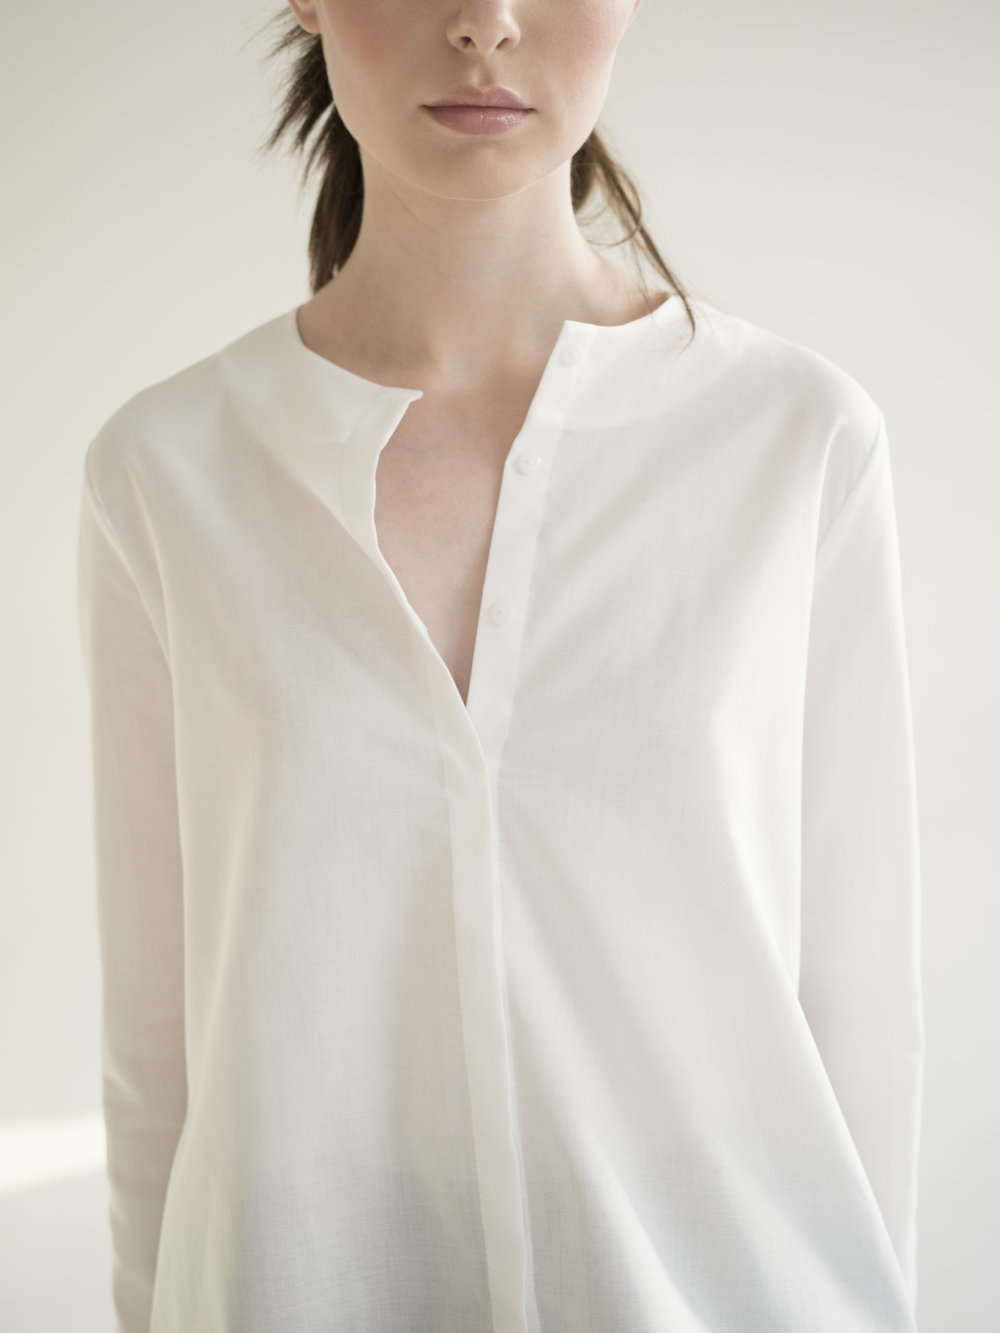 Simple Shirt Detail.jpg